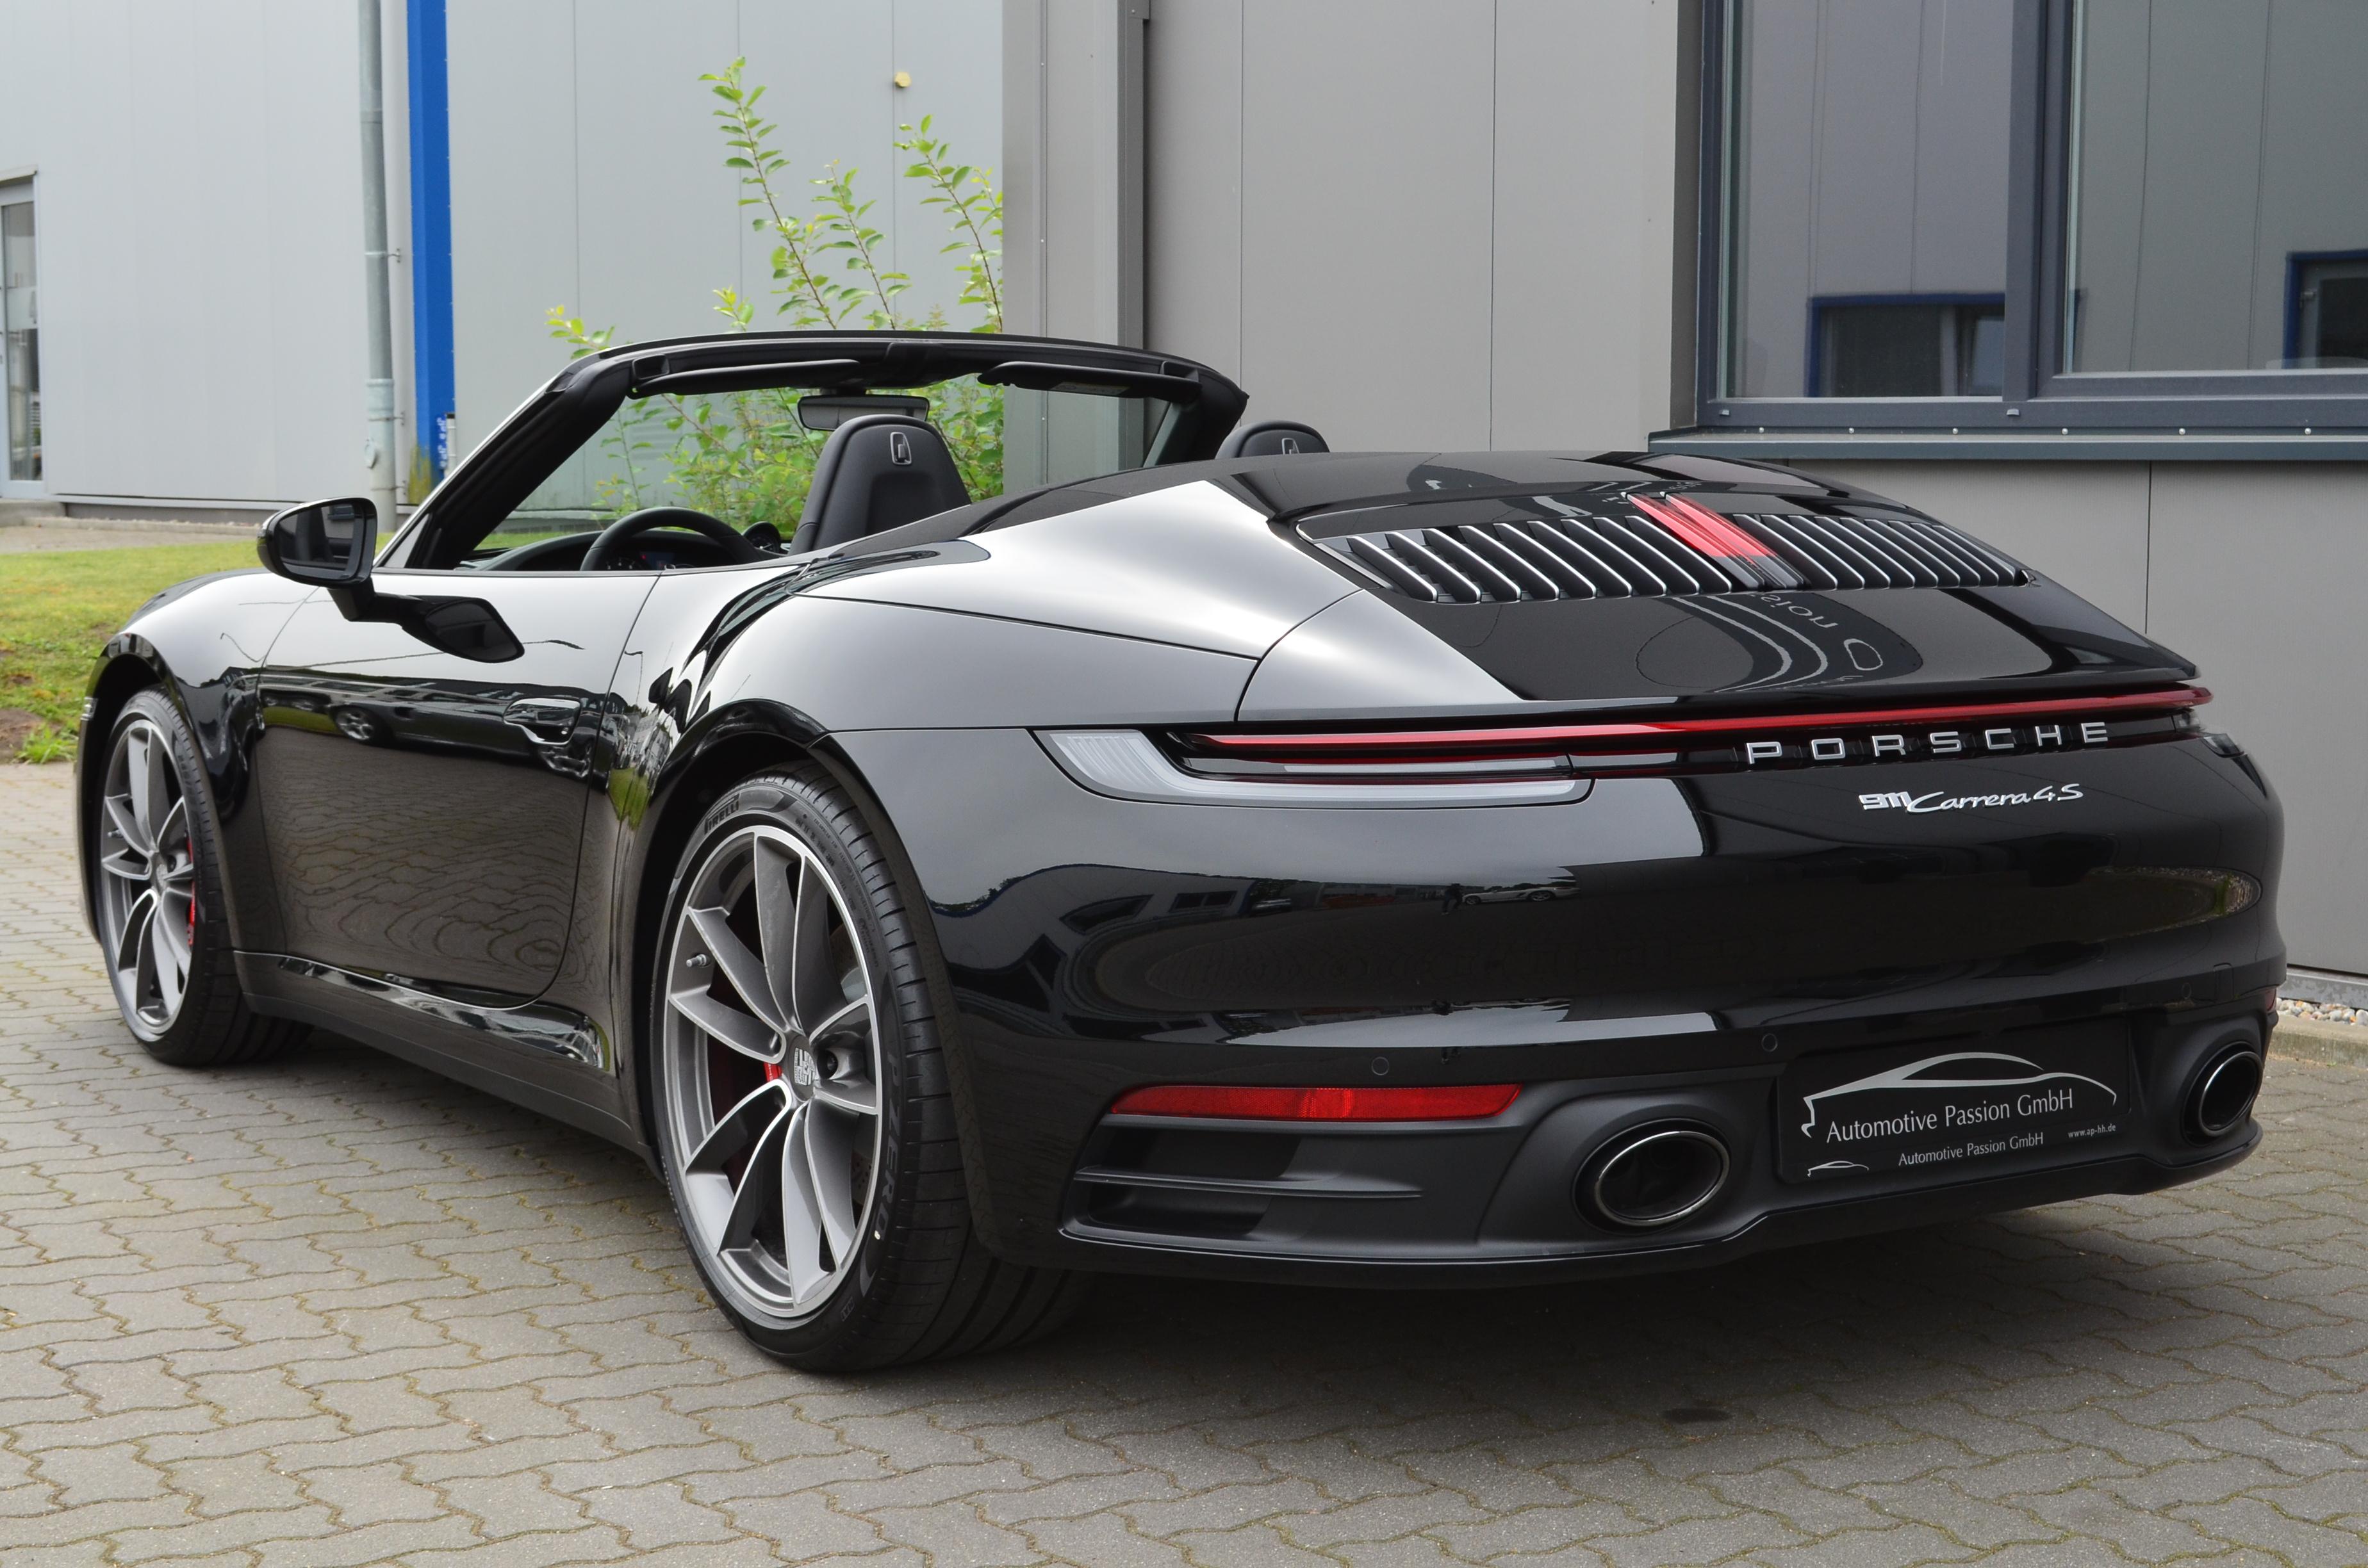 Porsche 992 Carrera 4s 2019 Elferspot Com Marketplace For Porsche Sports Cars